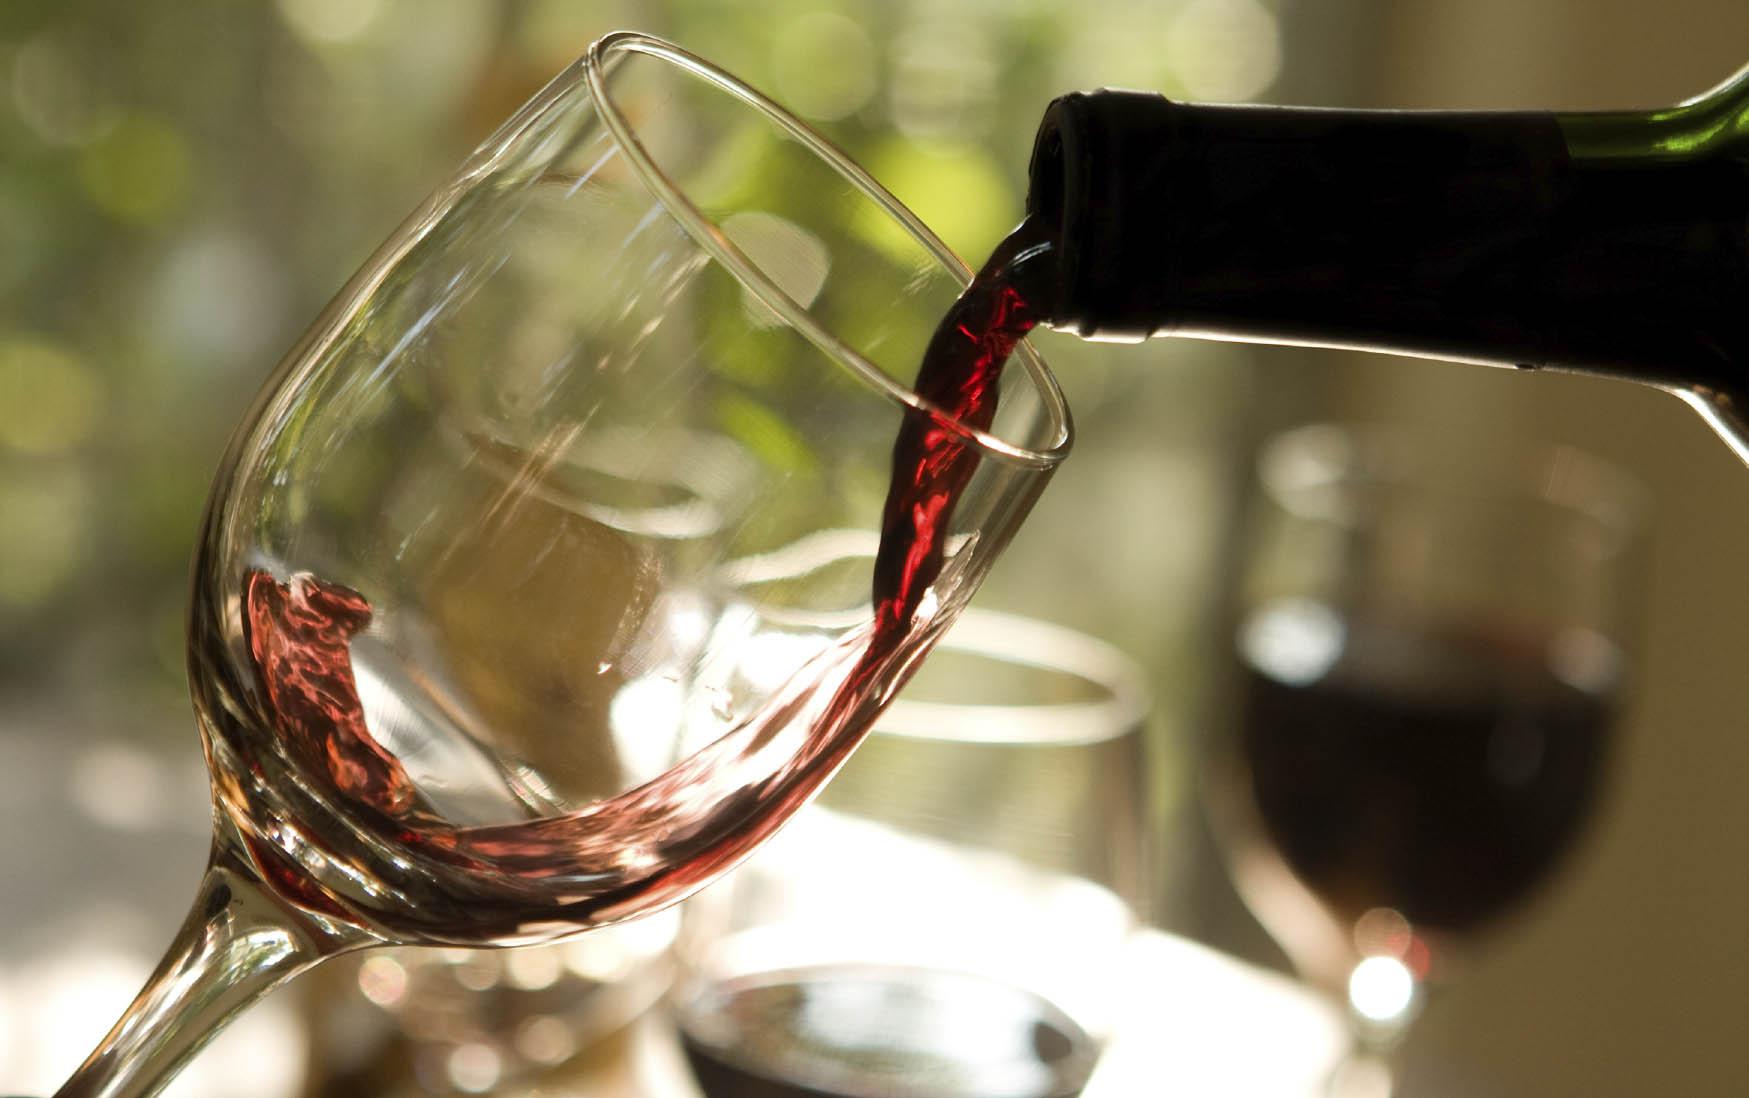 מזיגת יין לכוס